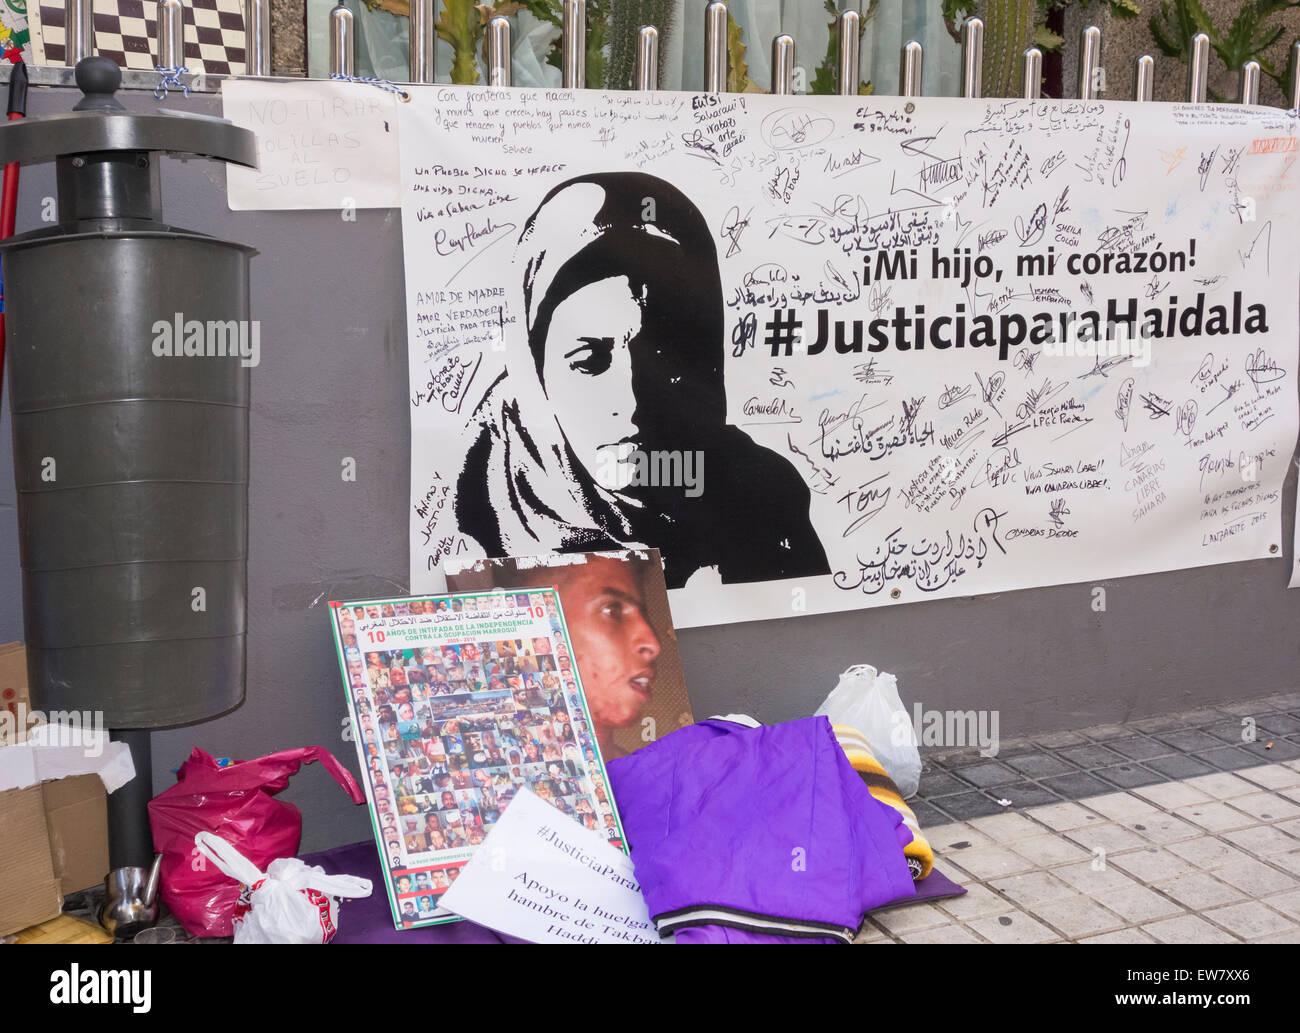 Friday, 19th June, 2015, Las Palmas, Gran Canaria, Canary Islands, Spain. Supporters of Takbar Haddi (see image - Stock Image